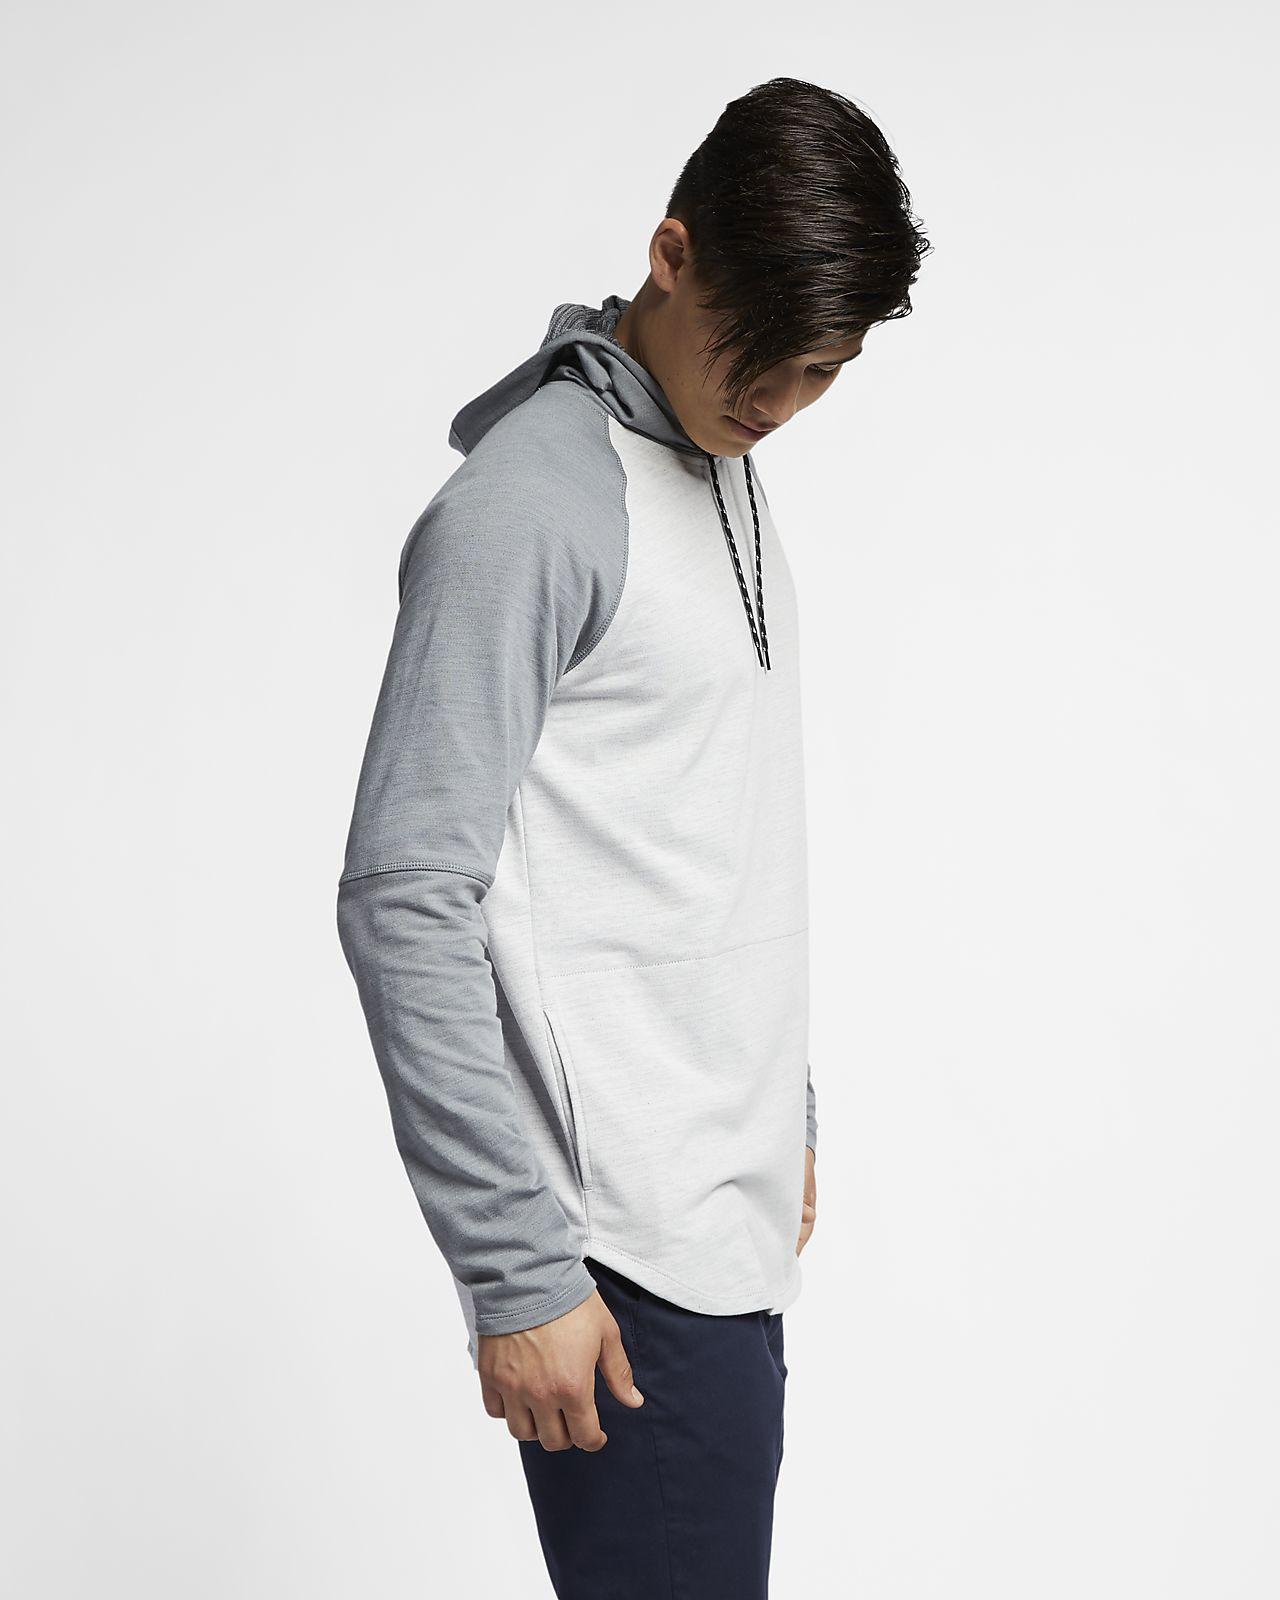 ef963290b2a Ανδρική μακρυμάνικη μπλούζα με κουκούλα Hurley Dri-FIT Grant. Nike ...